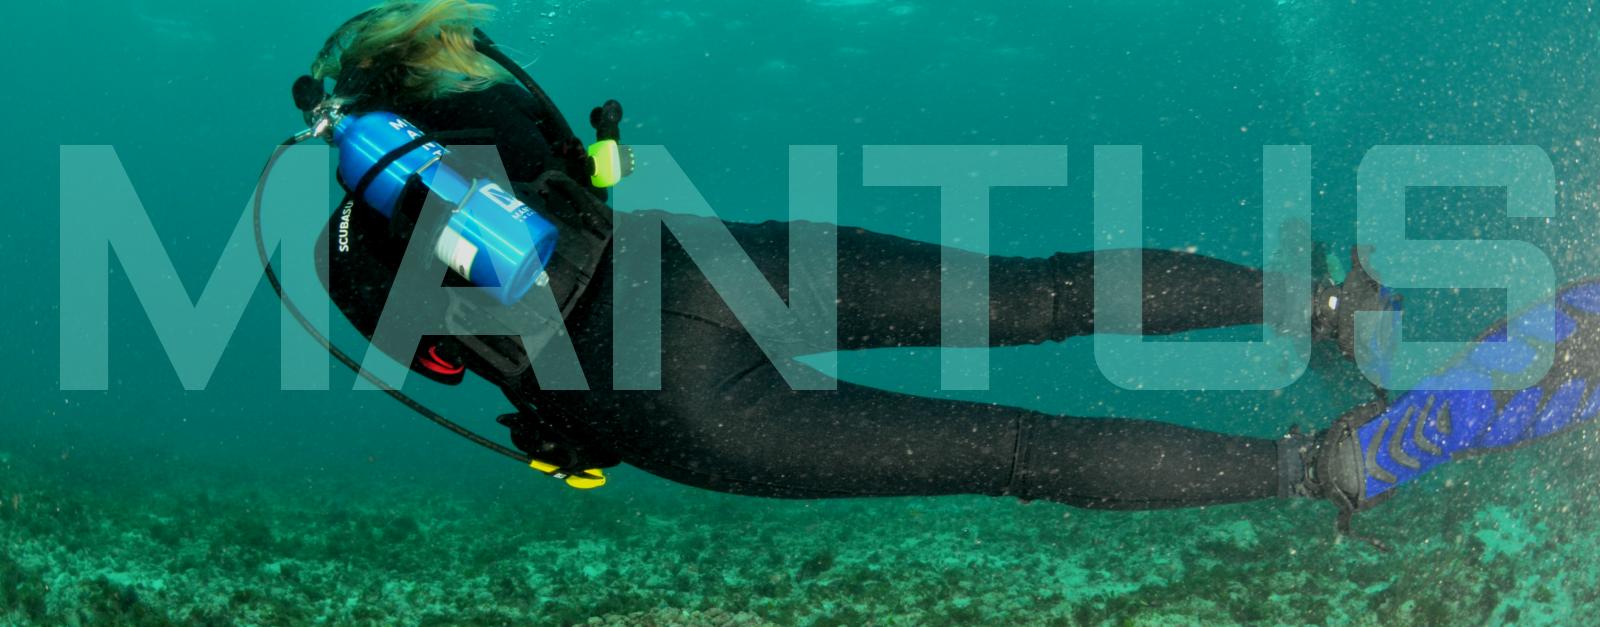 webxite-scuba- slider-image-3